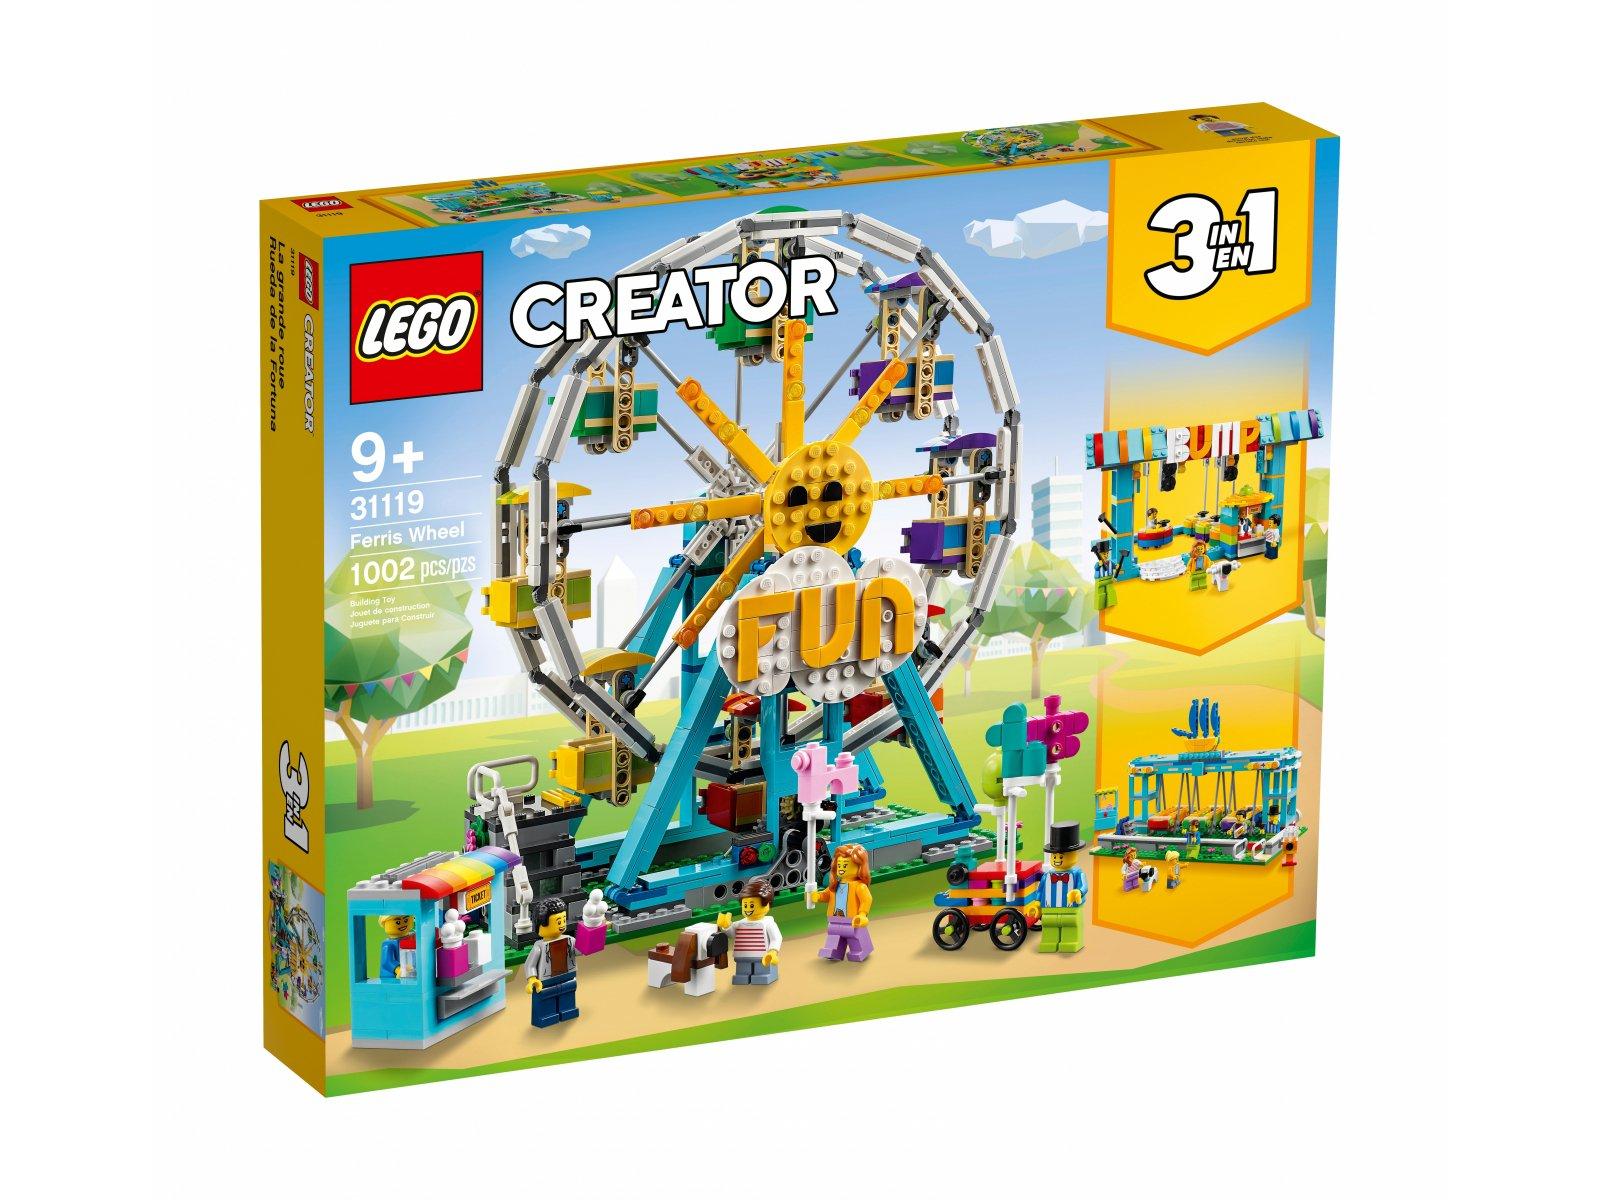 LEGO 31119 Creator 3 w 1 Diabelski młyn